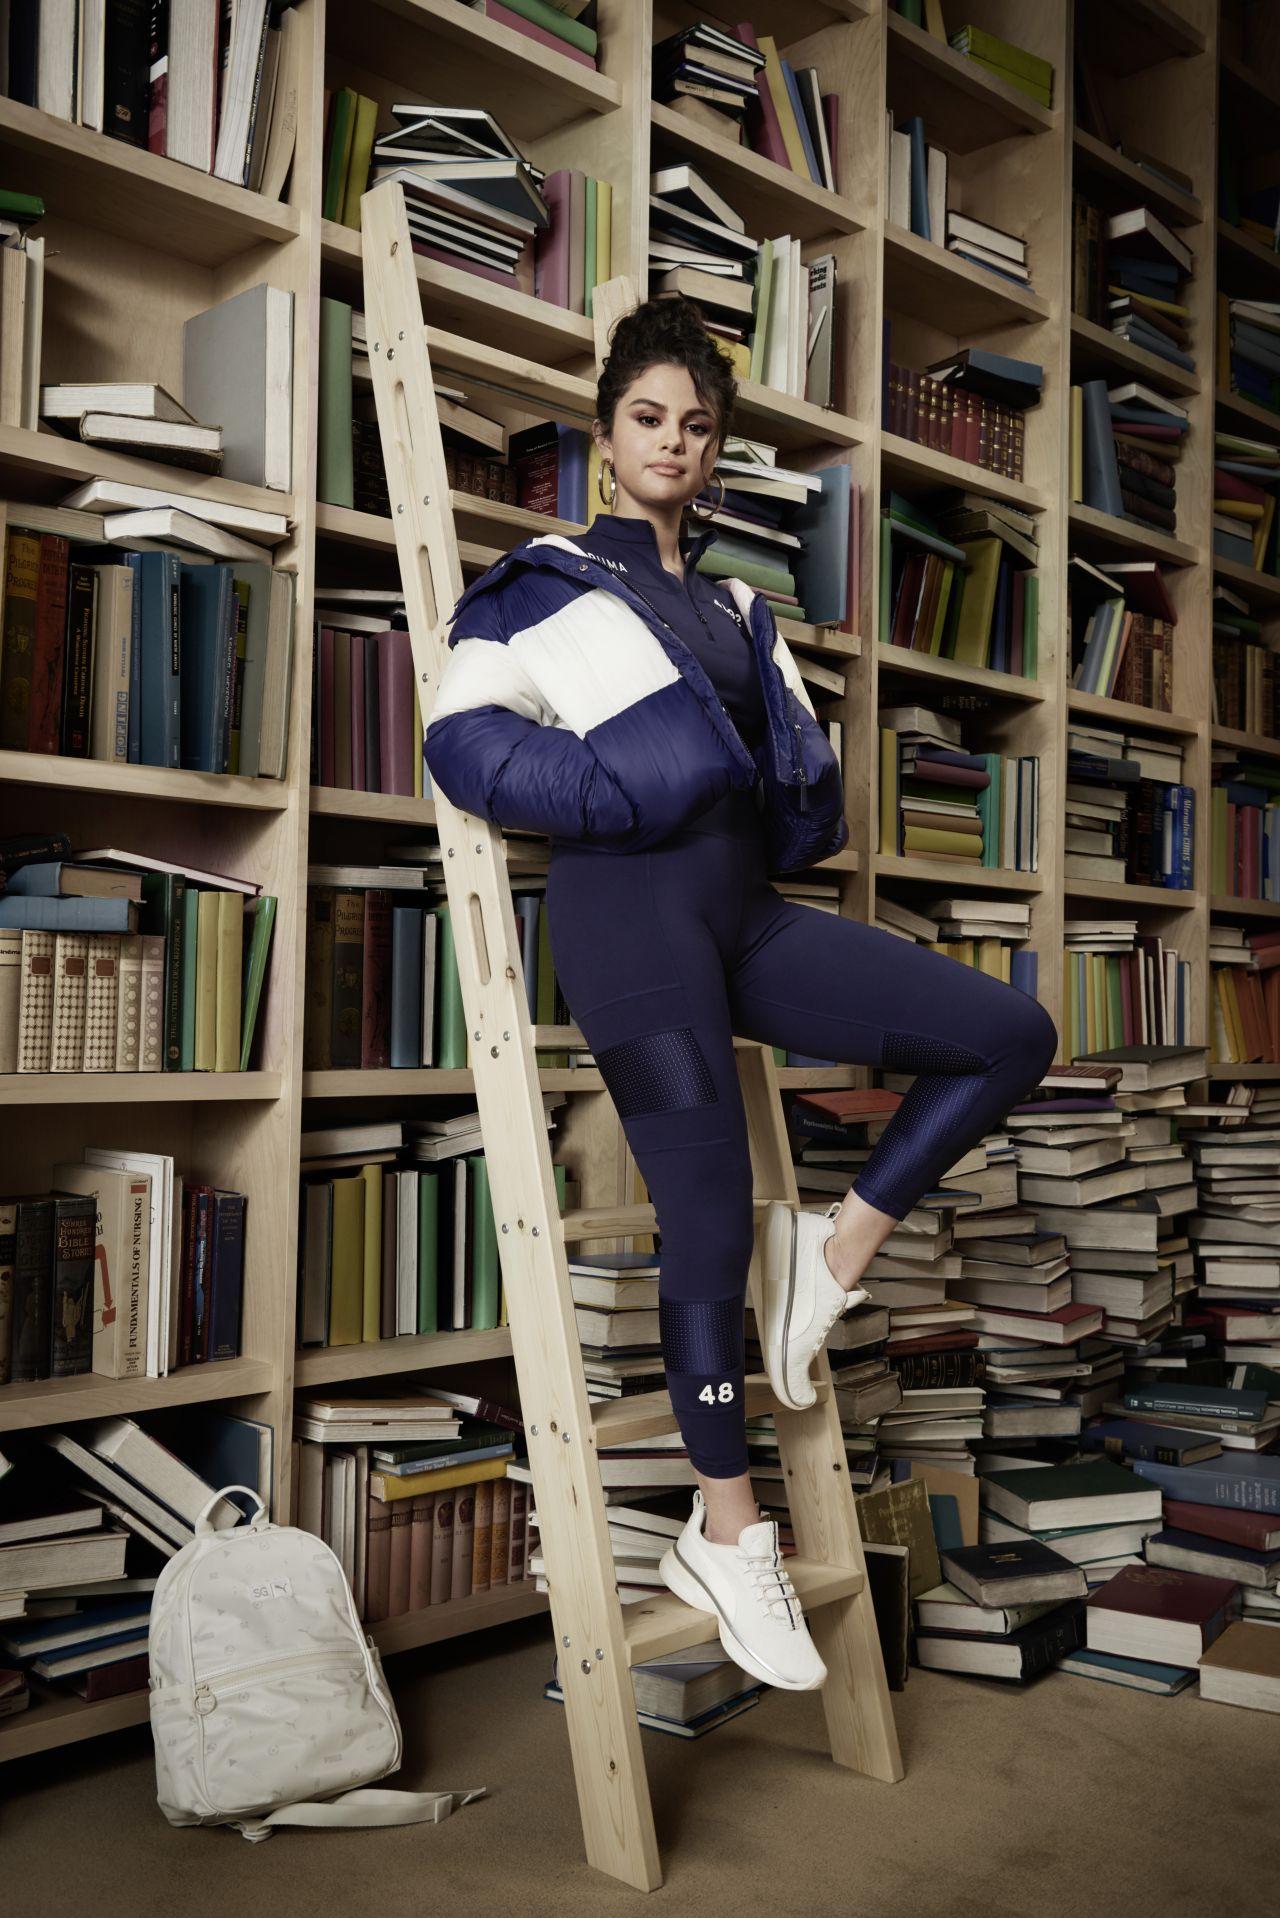 Selena Gomez - SG x PUMA A/W19 Collection HQ Photos ...